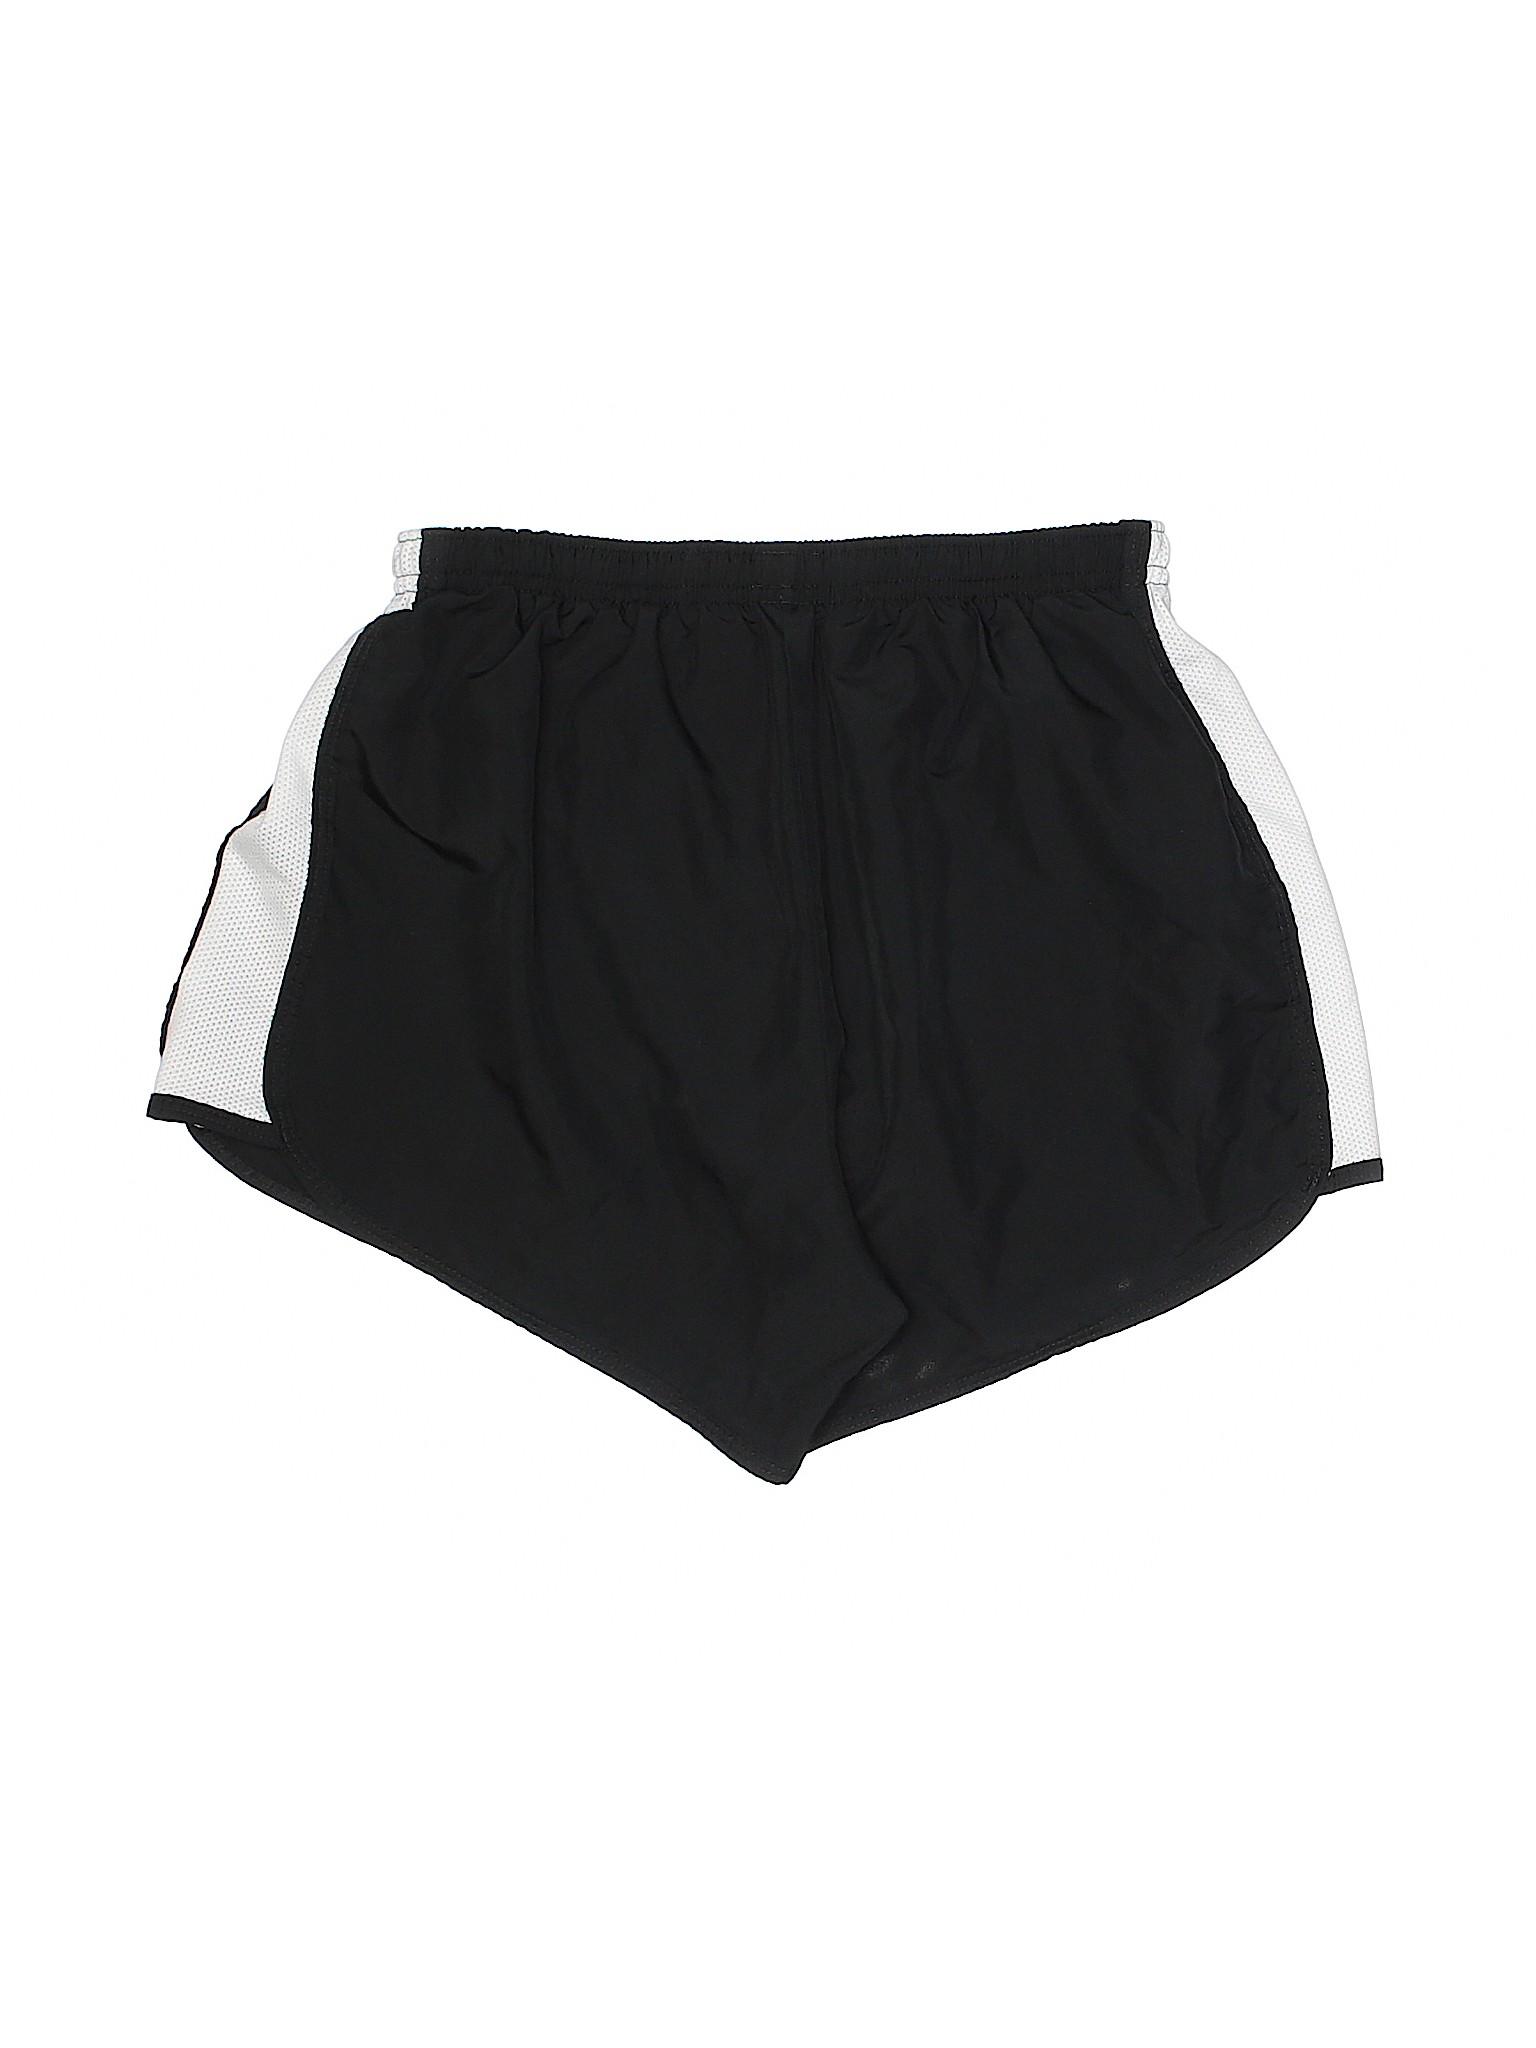 Boutique Boutique Shorts Reebok Reebok Athletic 5qSqnOzw0U